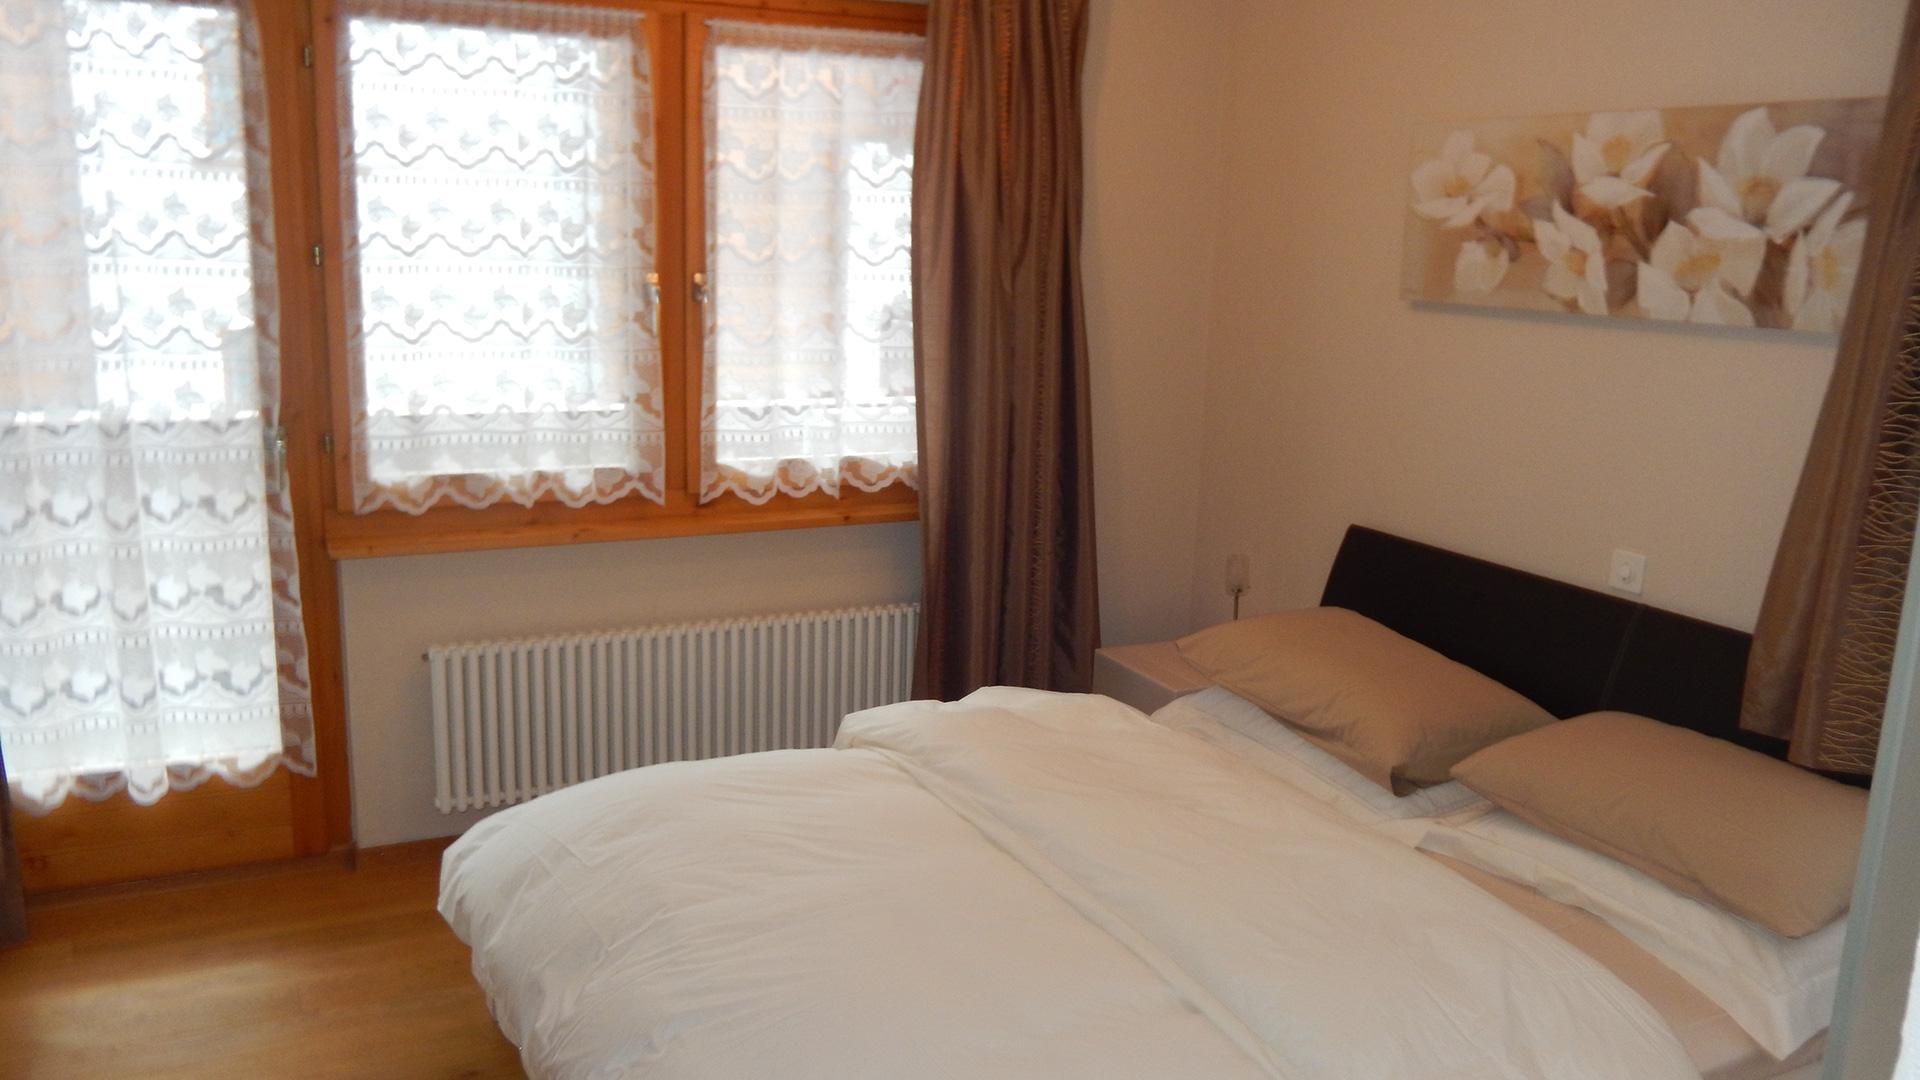 Chalet Jewel 2 Apartments, Switzerland